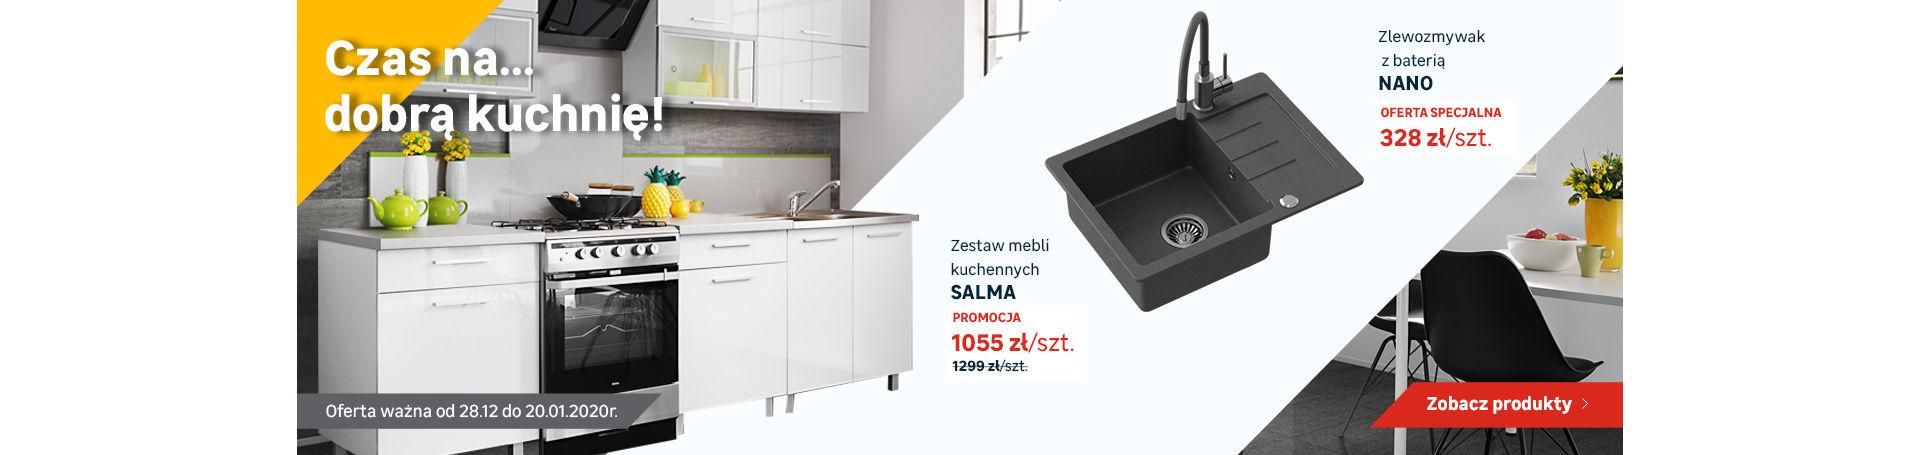 rr-kuchnie-7-20.01.2020-1323x455